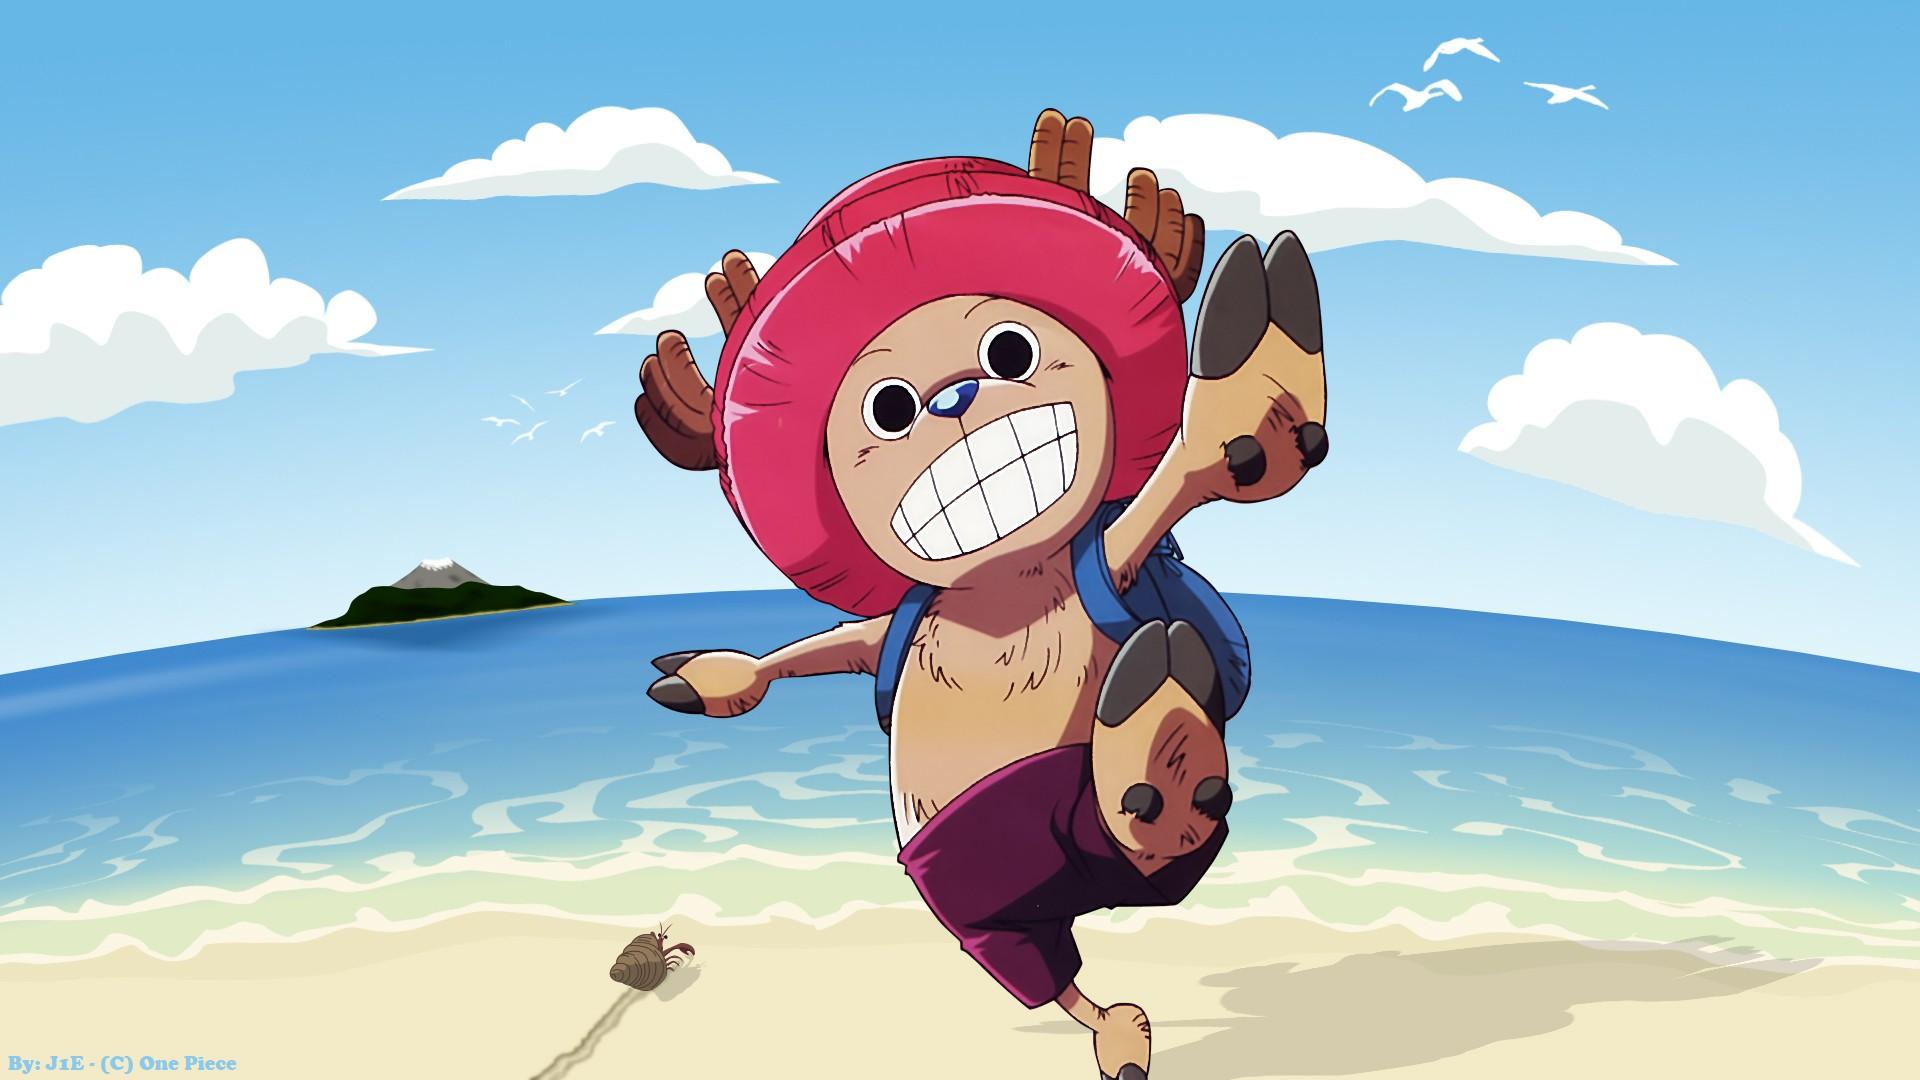 Wallpaper Illustration Anime Cartoon One Piece Tony